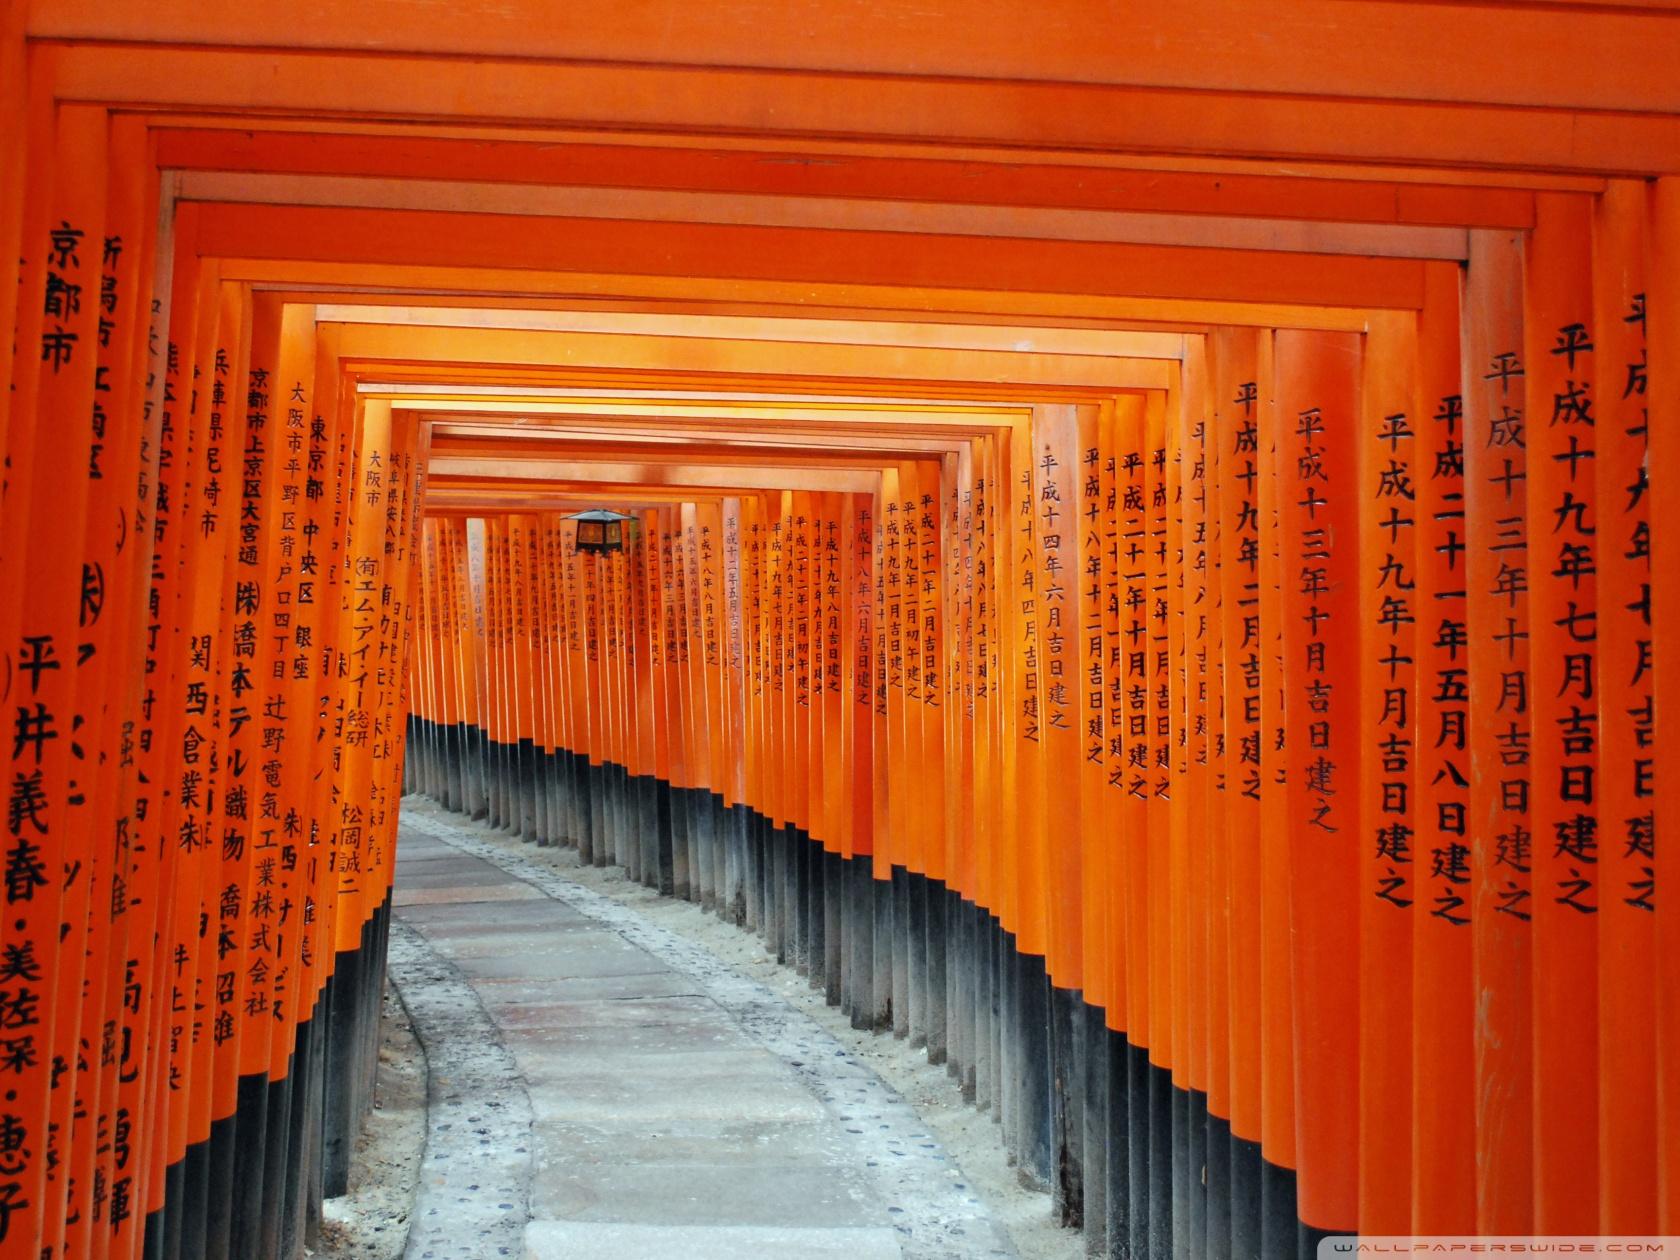 Fushimi Inari Taisha Kyoto Japan 4K HD Desktop Wallpaper for 1680x1260